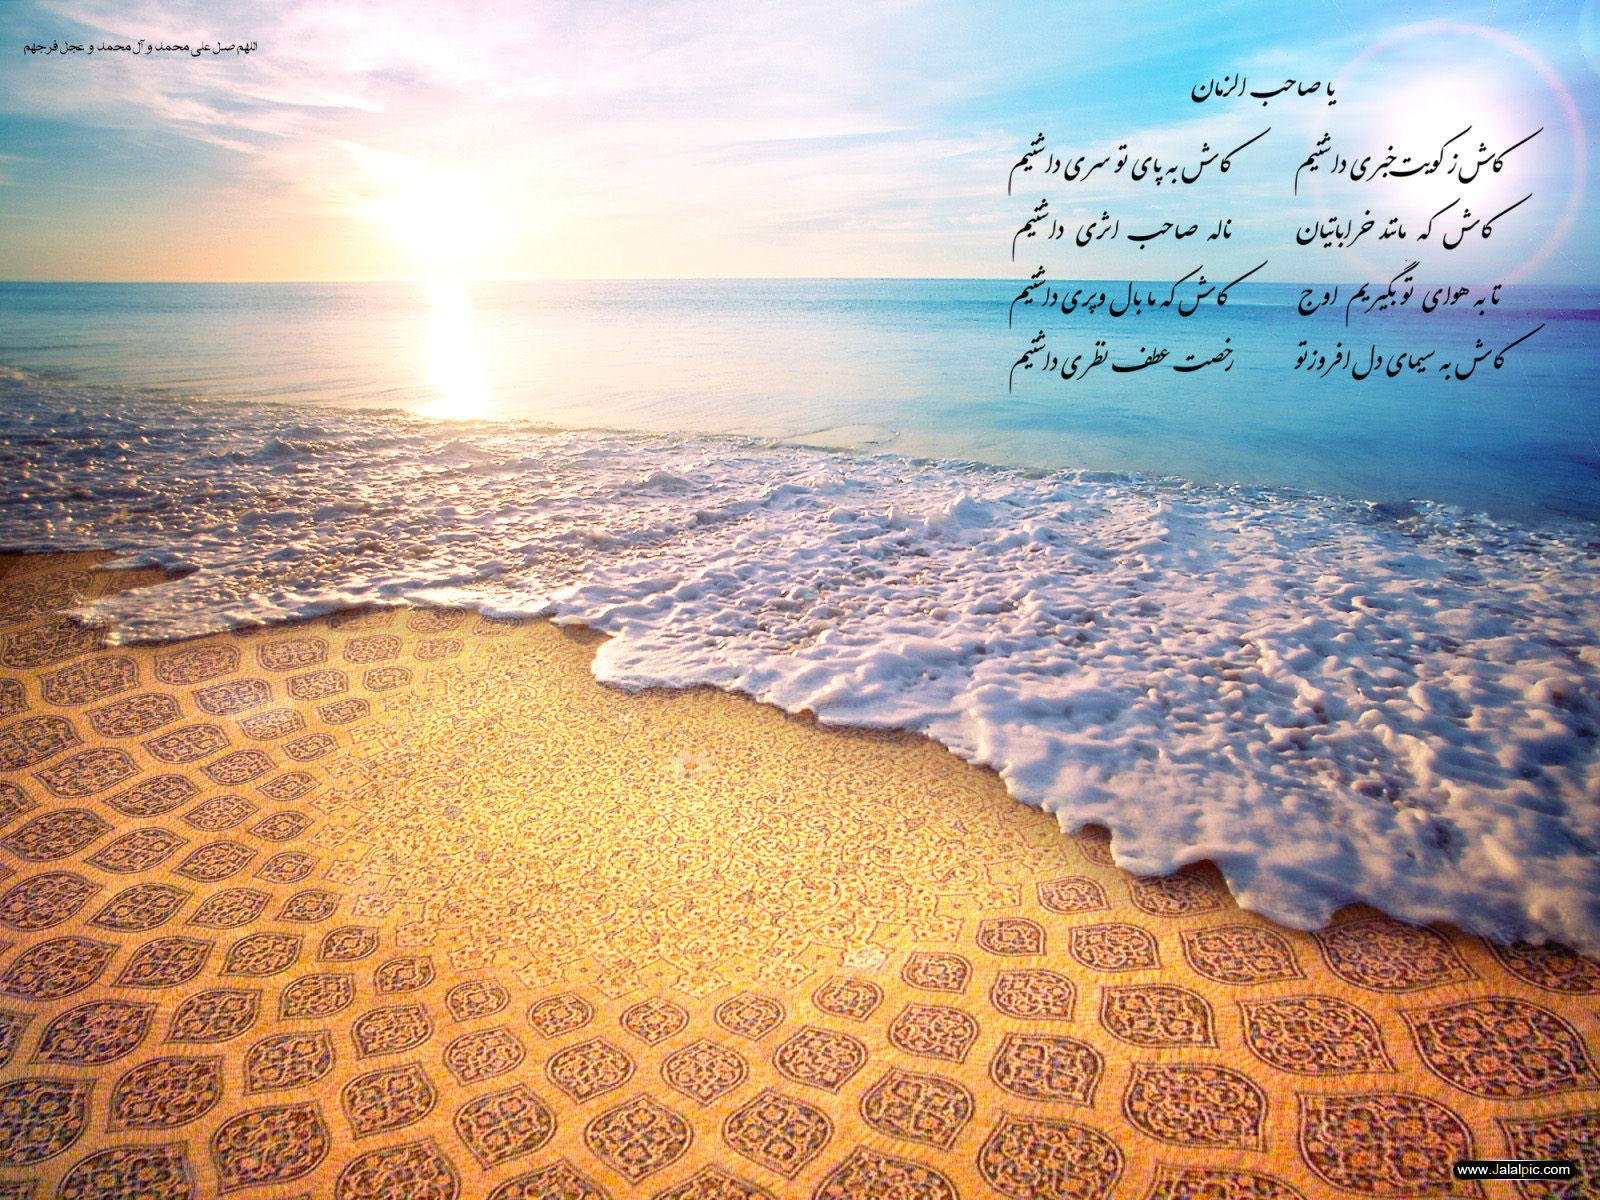 عکس زمینه حضرت محمد